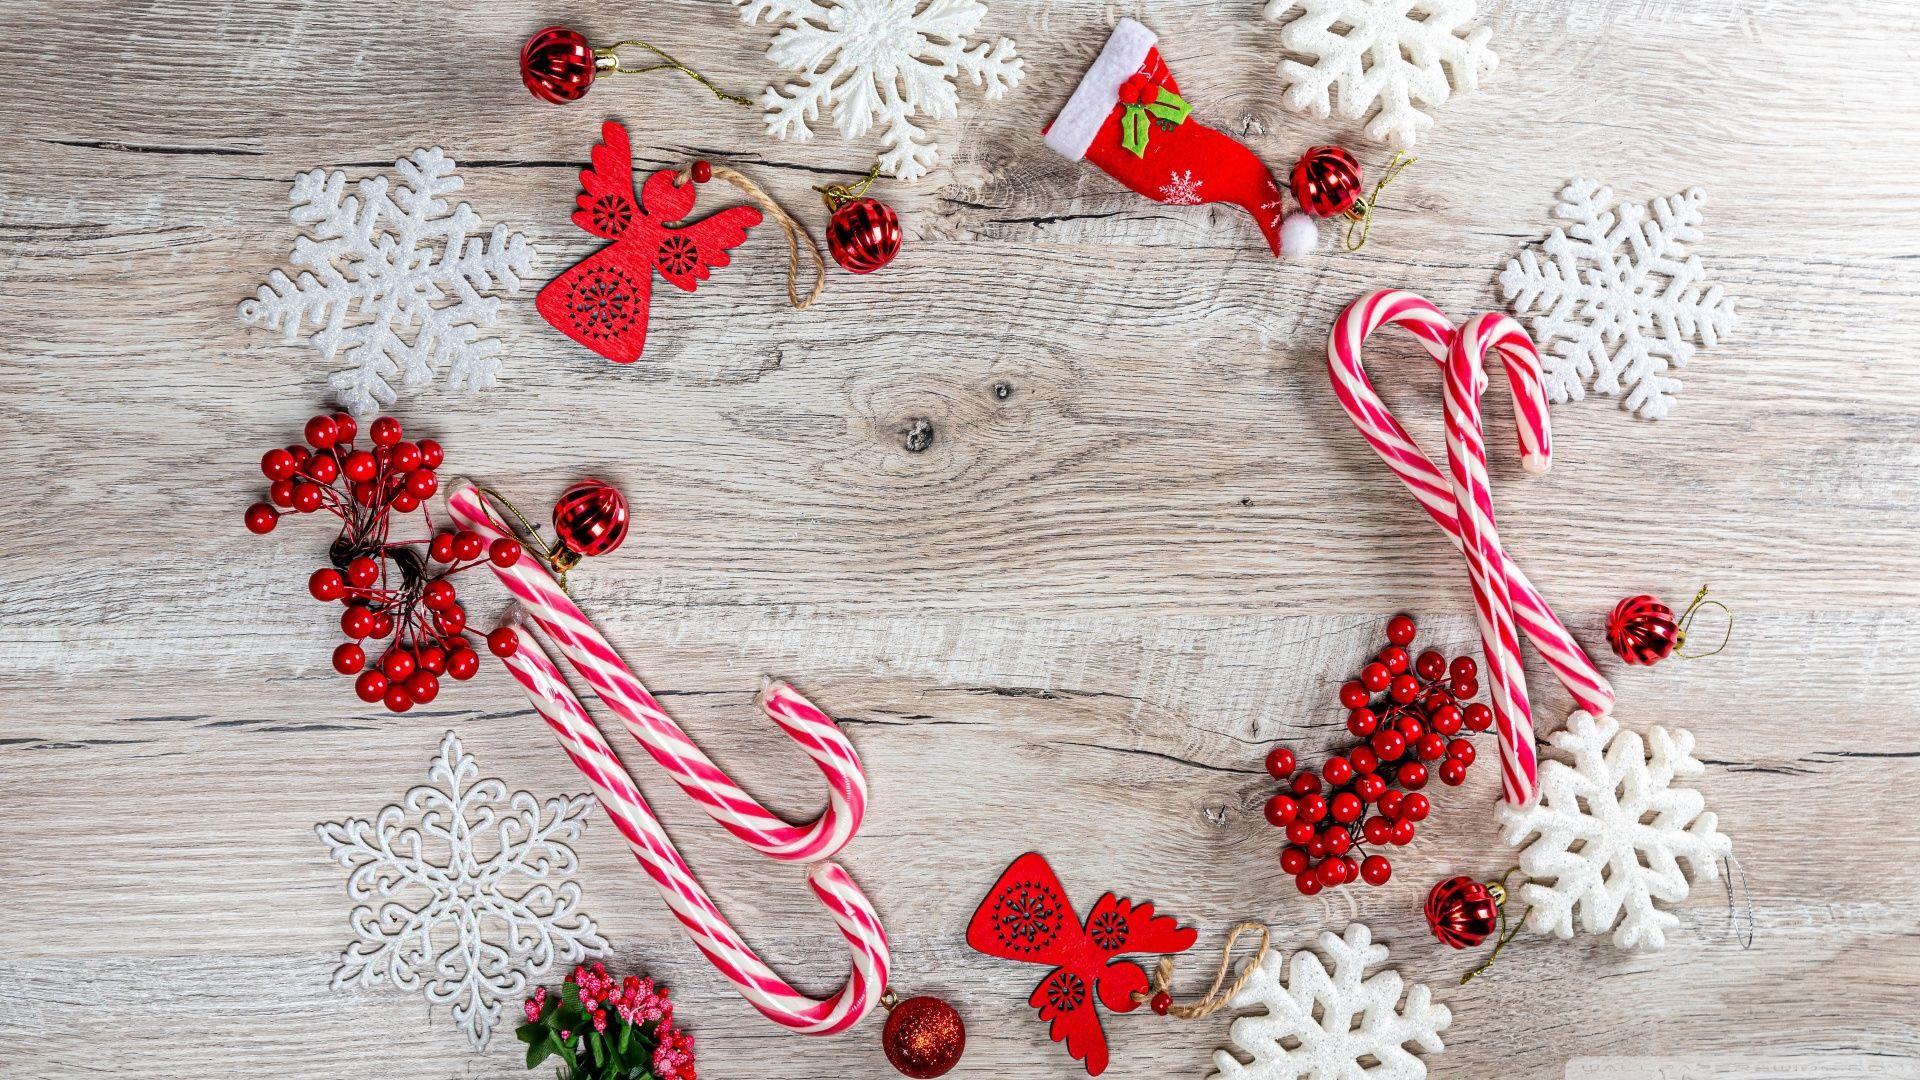 Christmas Decorations 2019 Ultra Hd Wallpaper For 4k Uhd Widescreen Desktop Tablet Smartph Christmas Decorations Holiday Wallpaper Wallpaper